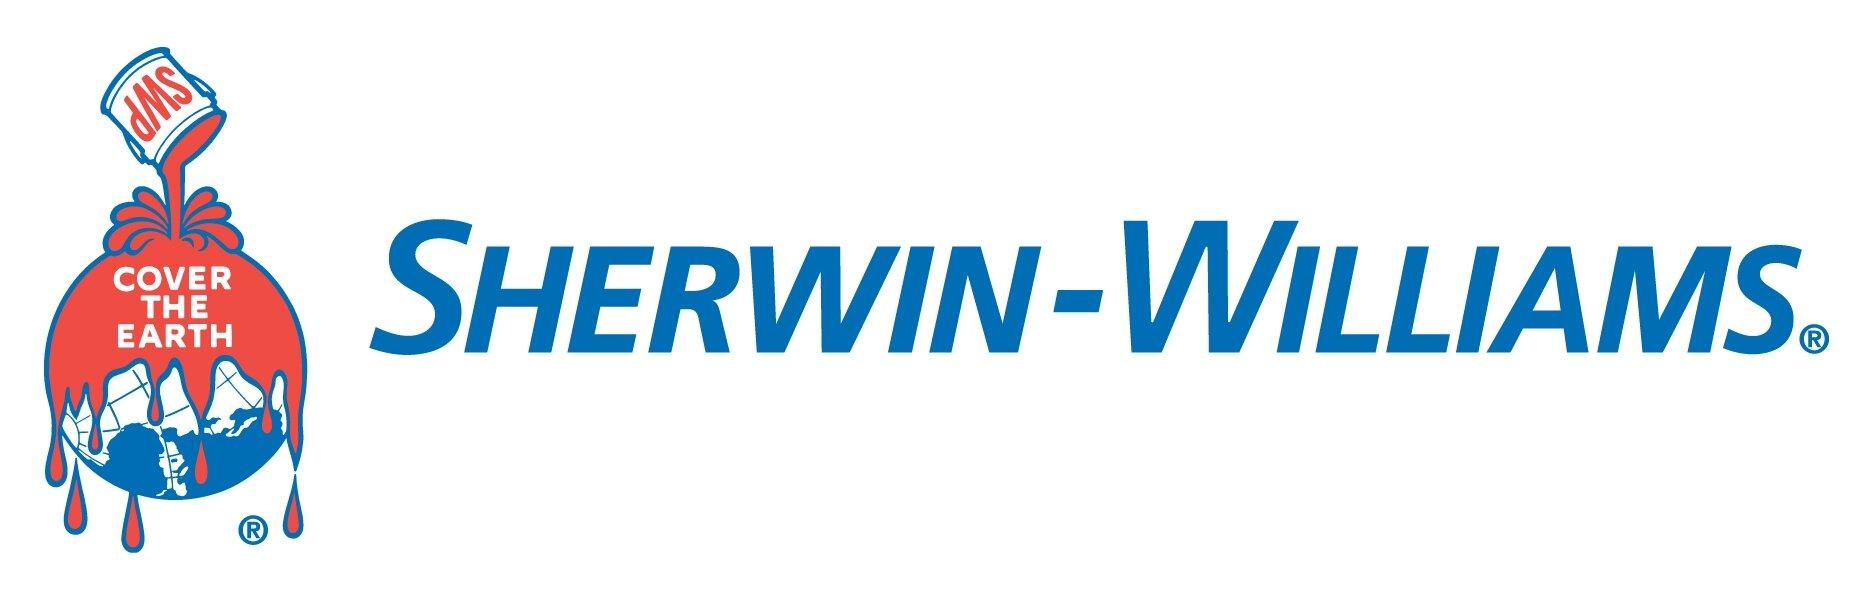 SW Banner Logo Color White background only.JPG